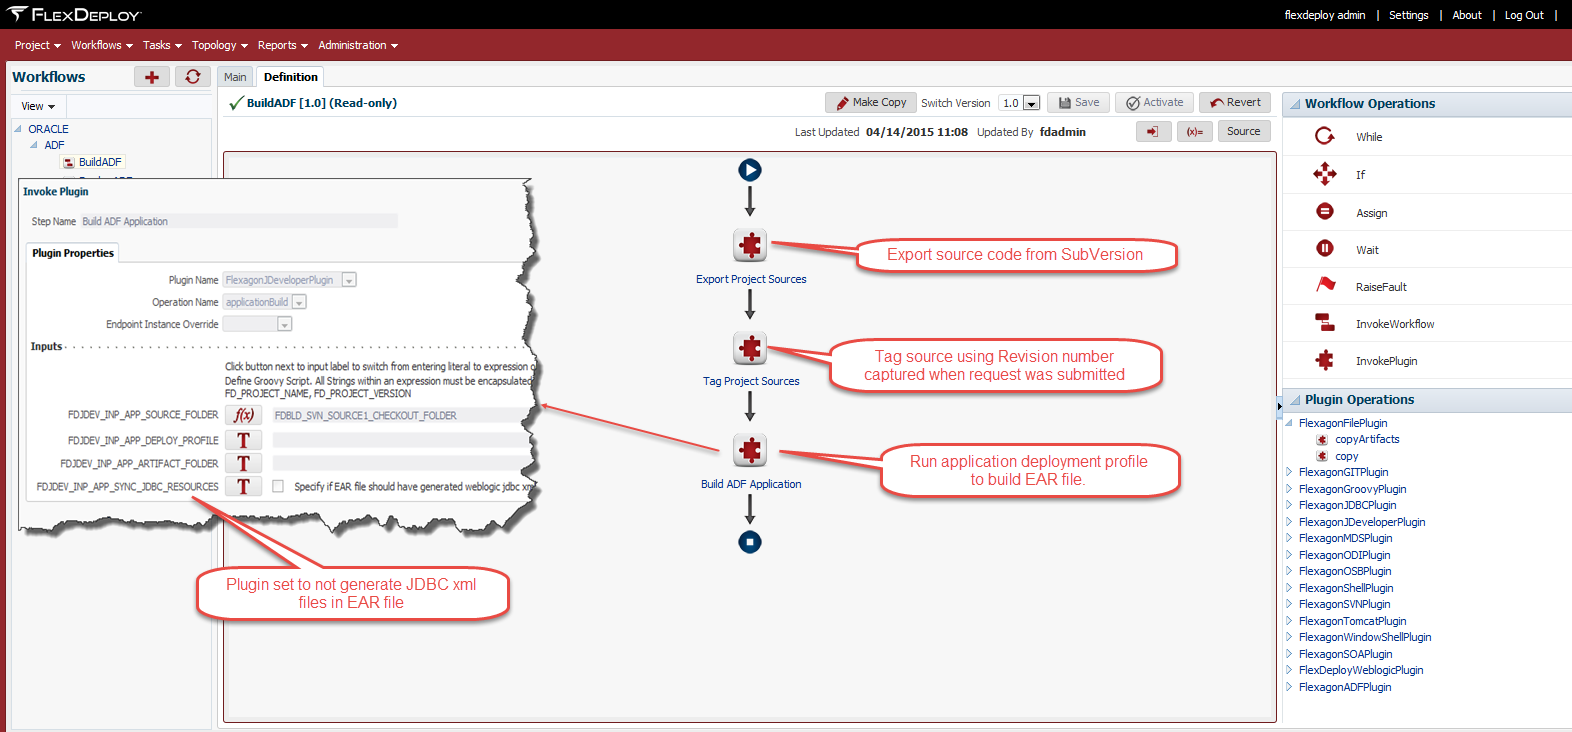 FlexDeploy Build ADF Workflow